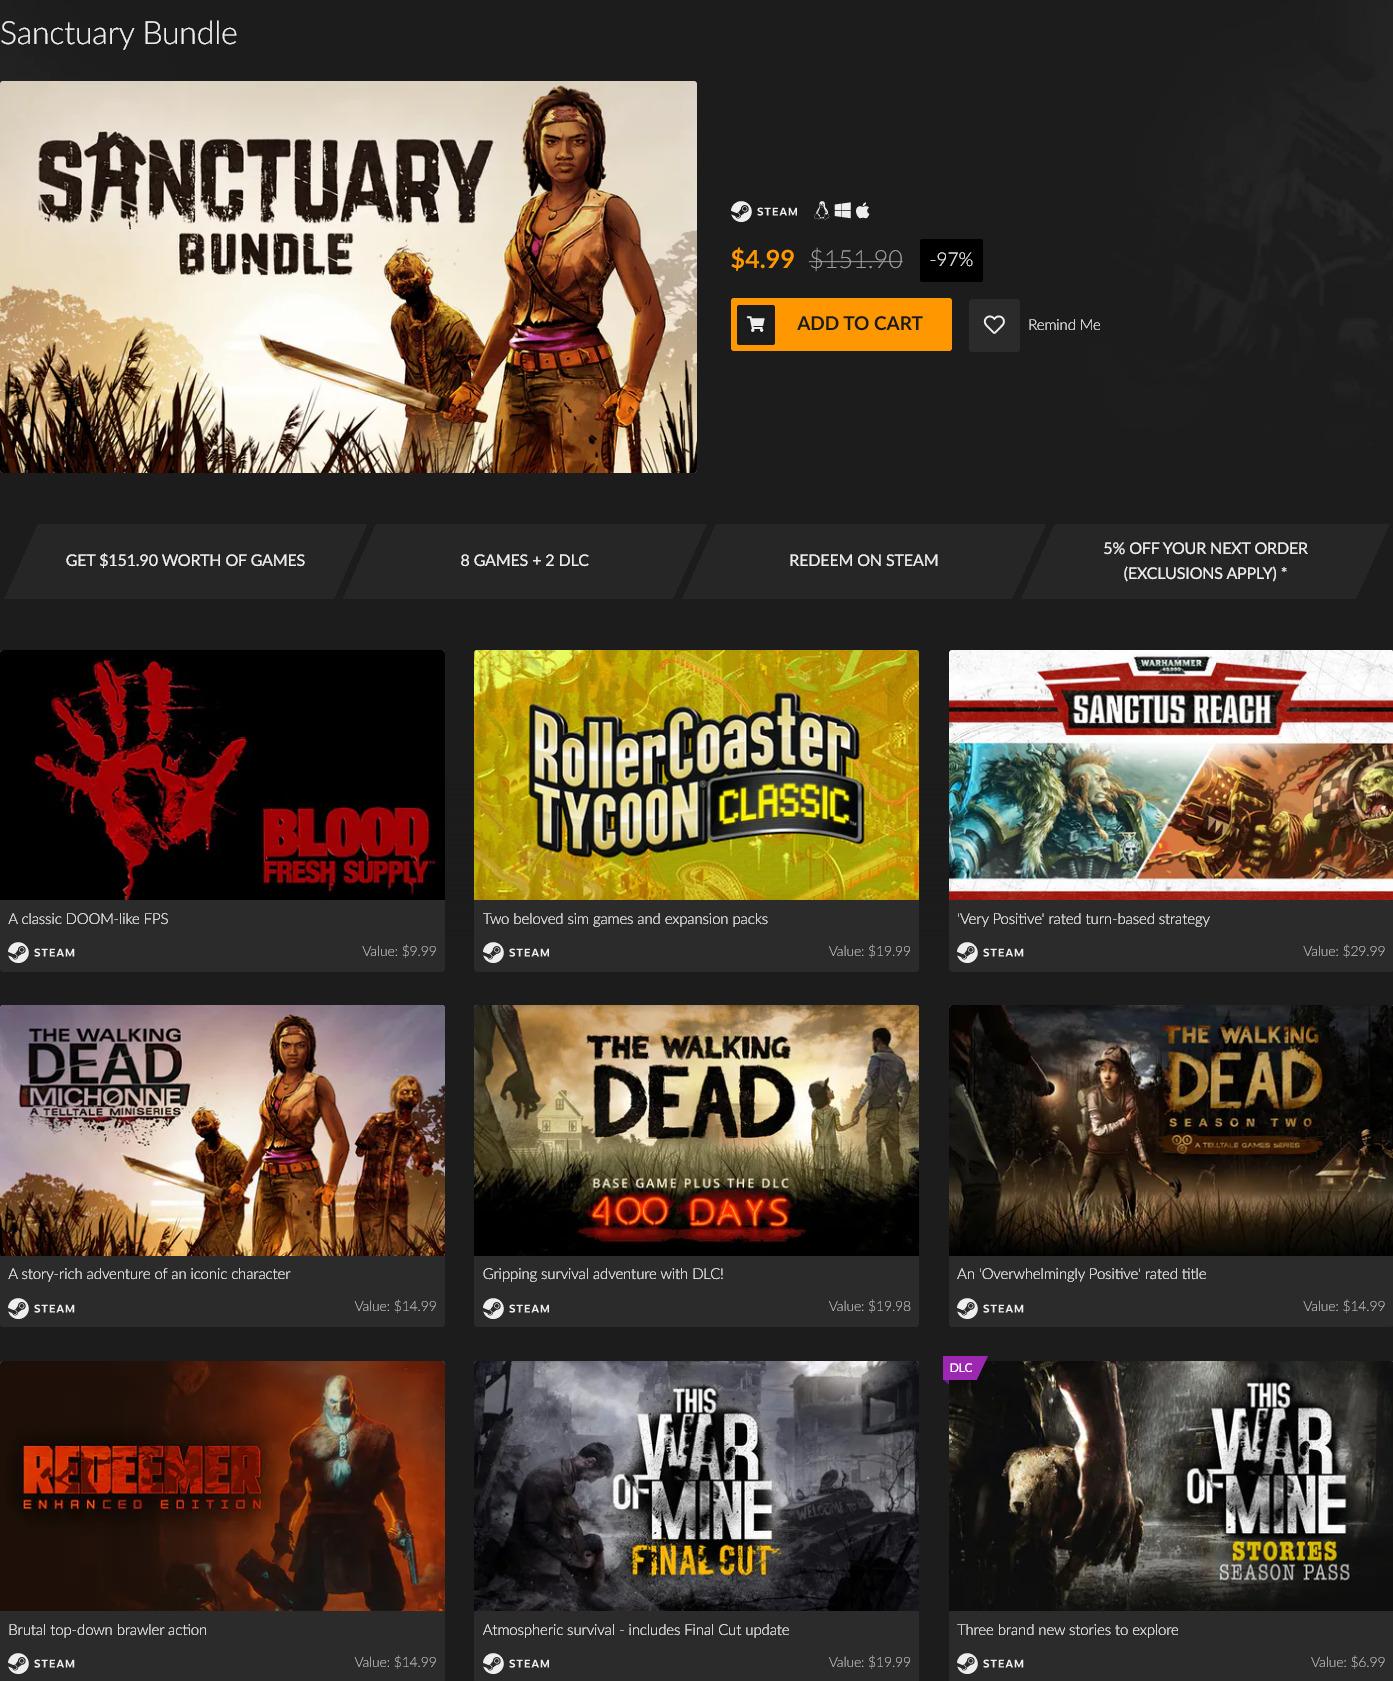 Screenshot_2020-04-24 Sanctuary Bundle Steam Game Bundle Fanatical.jpg